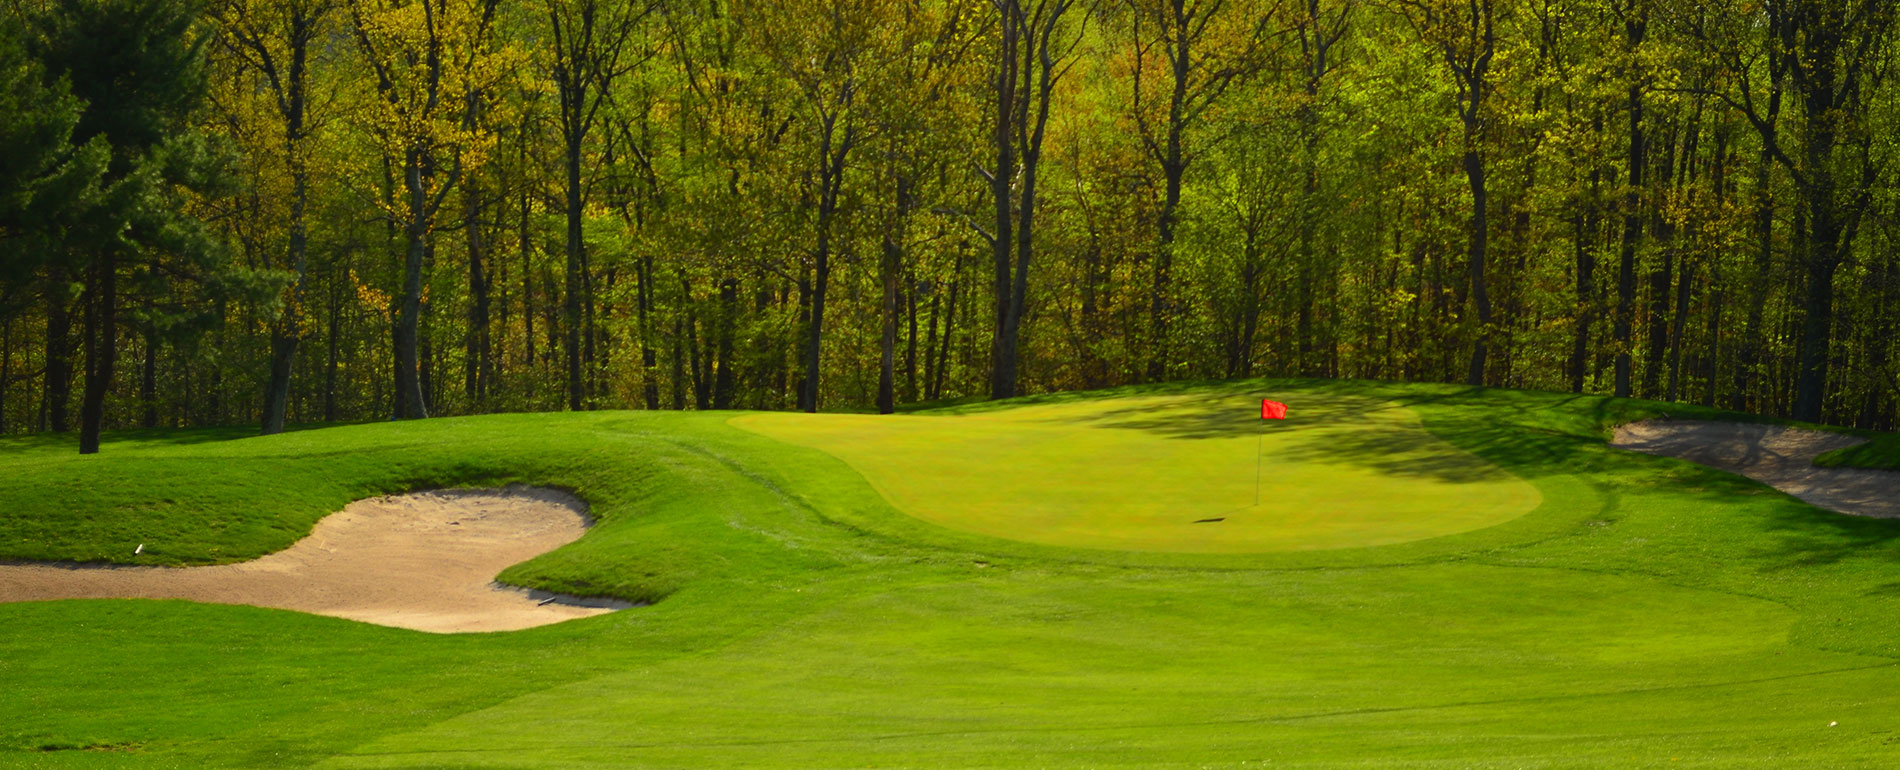 Pocono Golf course woods